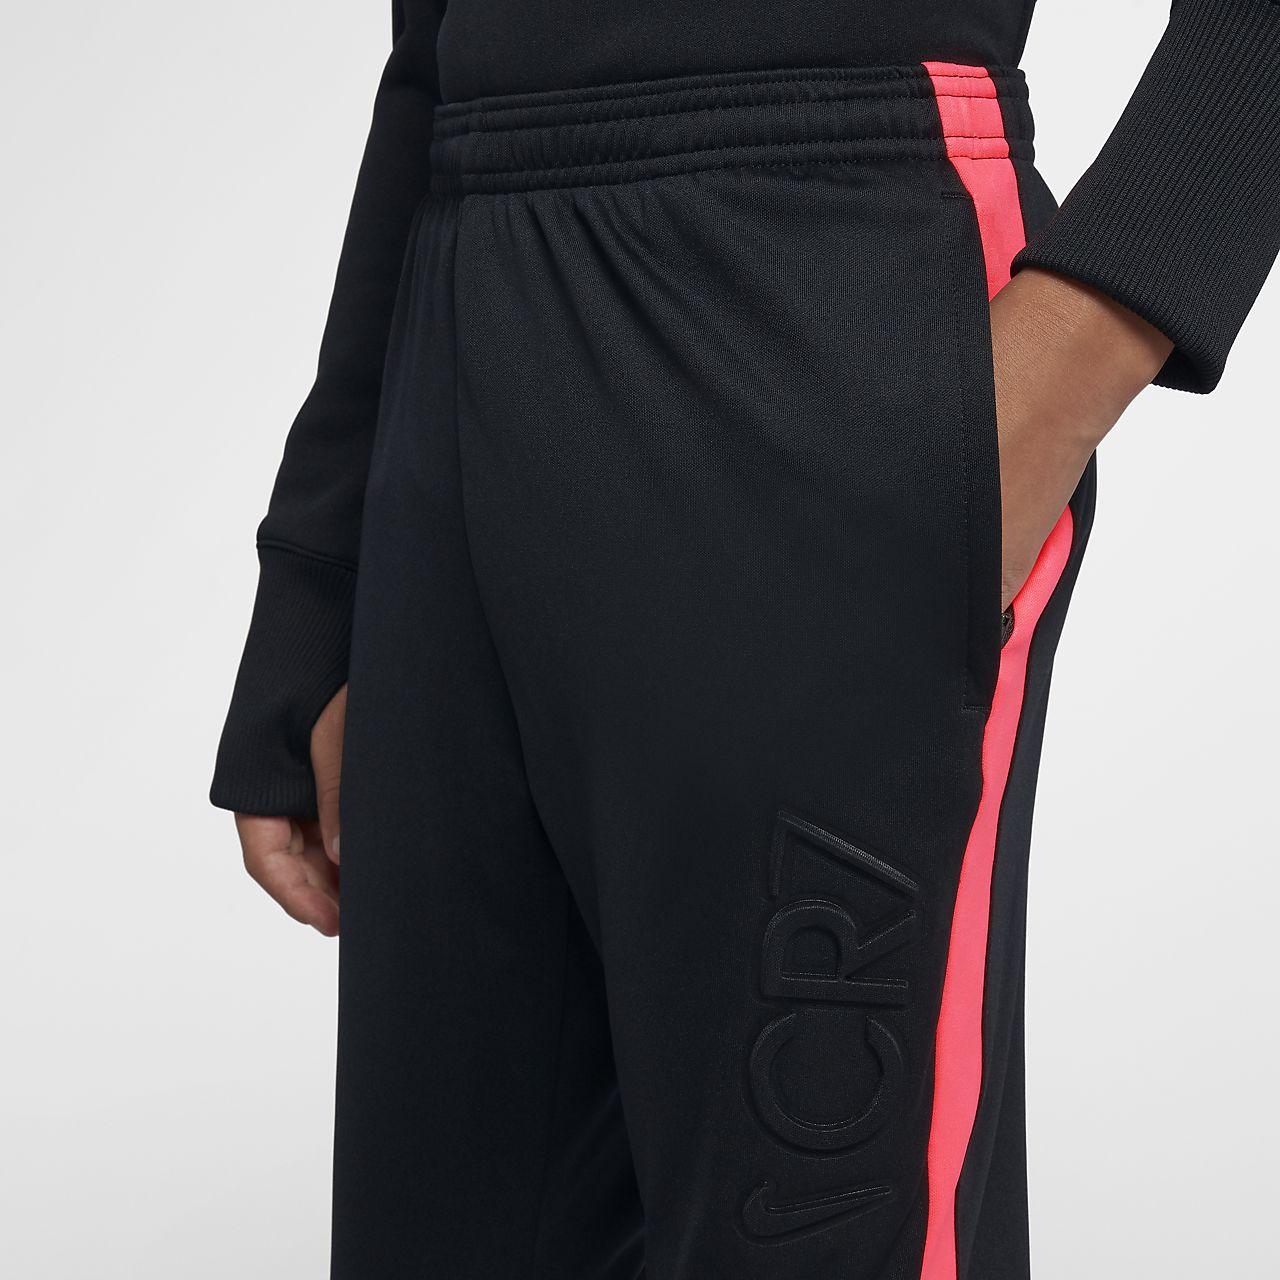 Pantalones de fútbol para niño talla grande Nike Dri-FIT CR7. Nike ... 79b9016af970